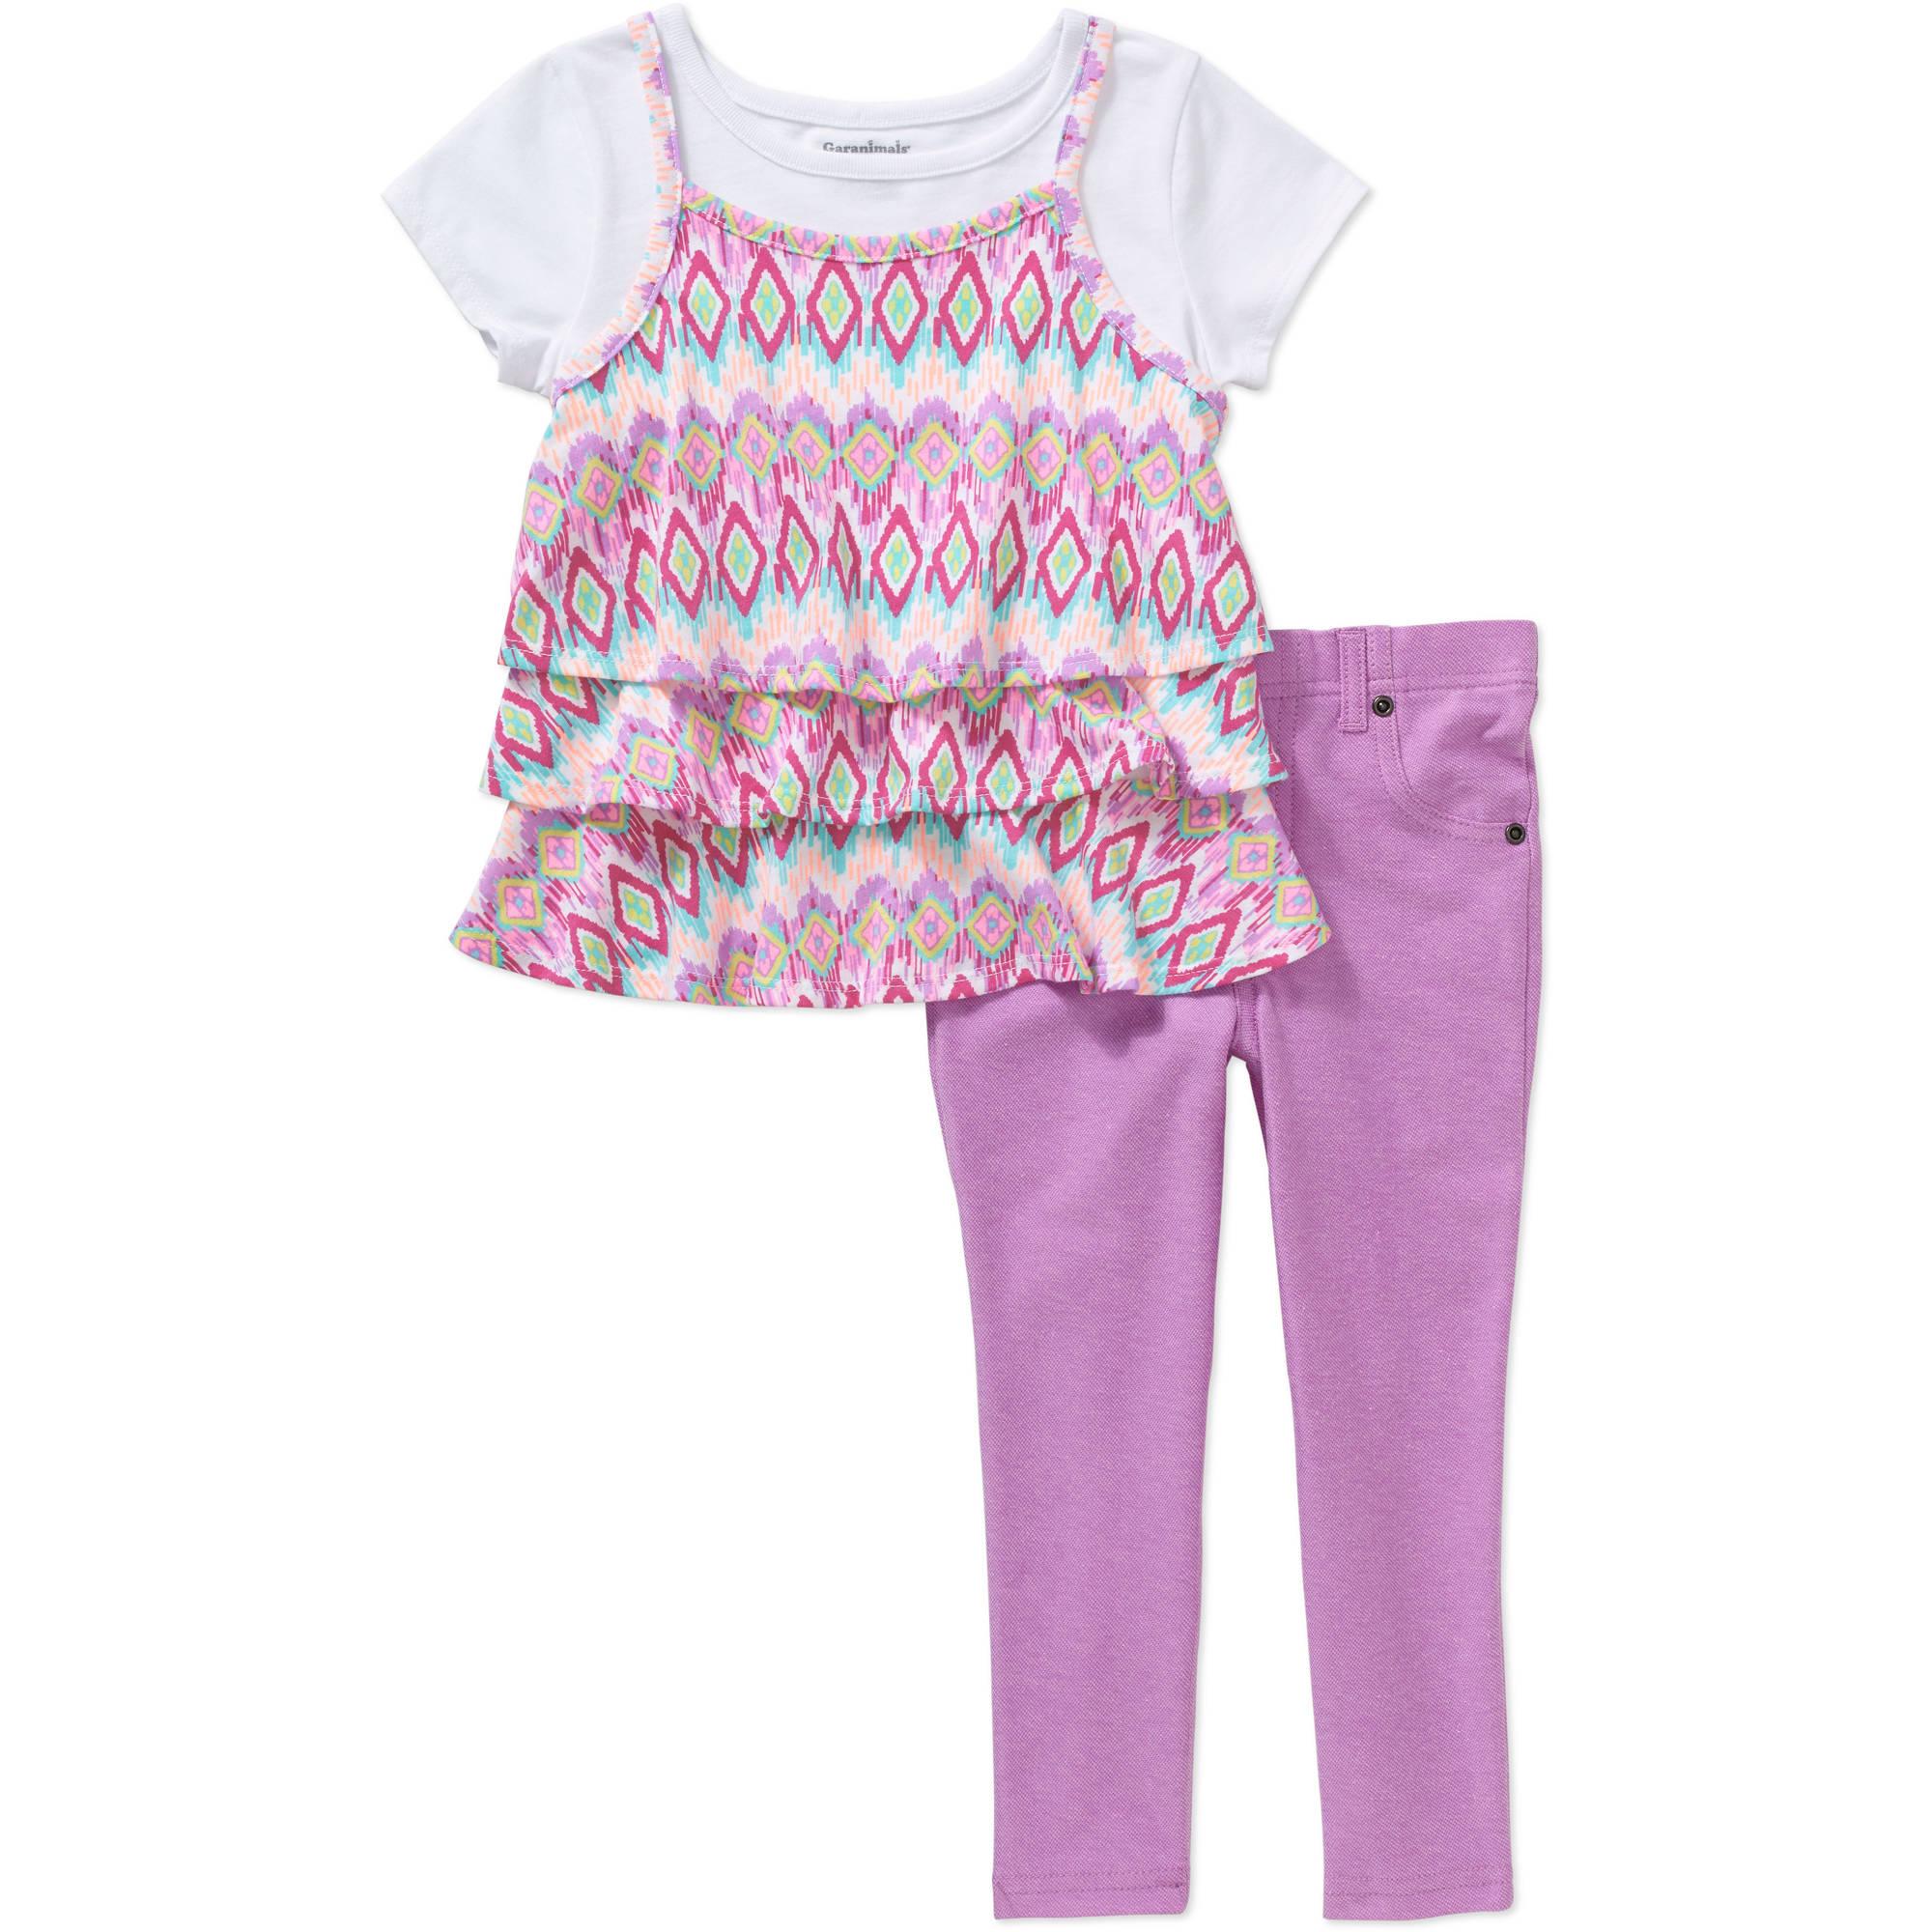 Garanimals Baby Toddler Girl Short Sleeve 2Fer Ruffle Tee ...